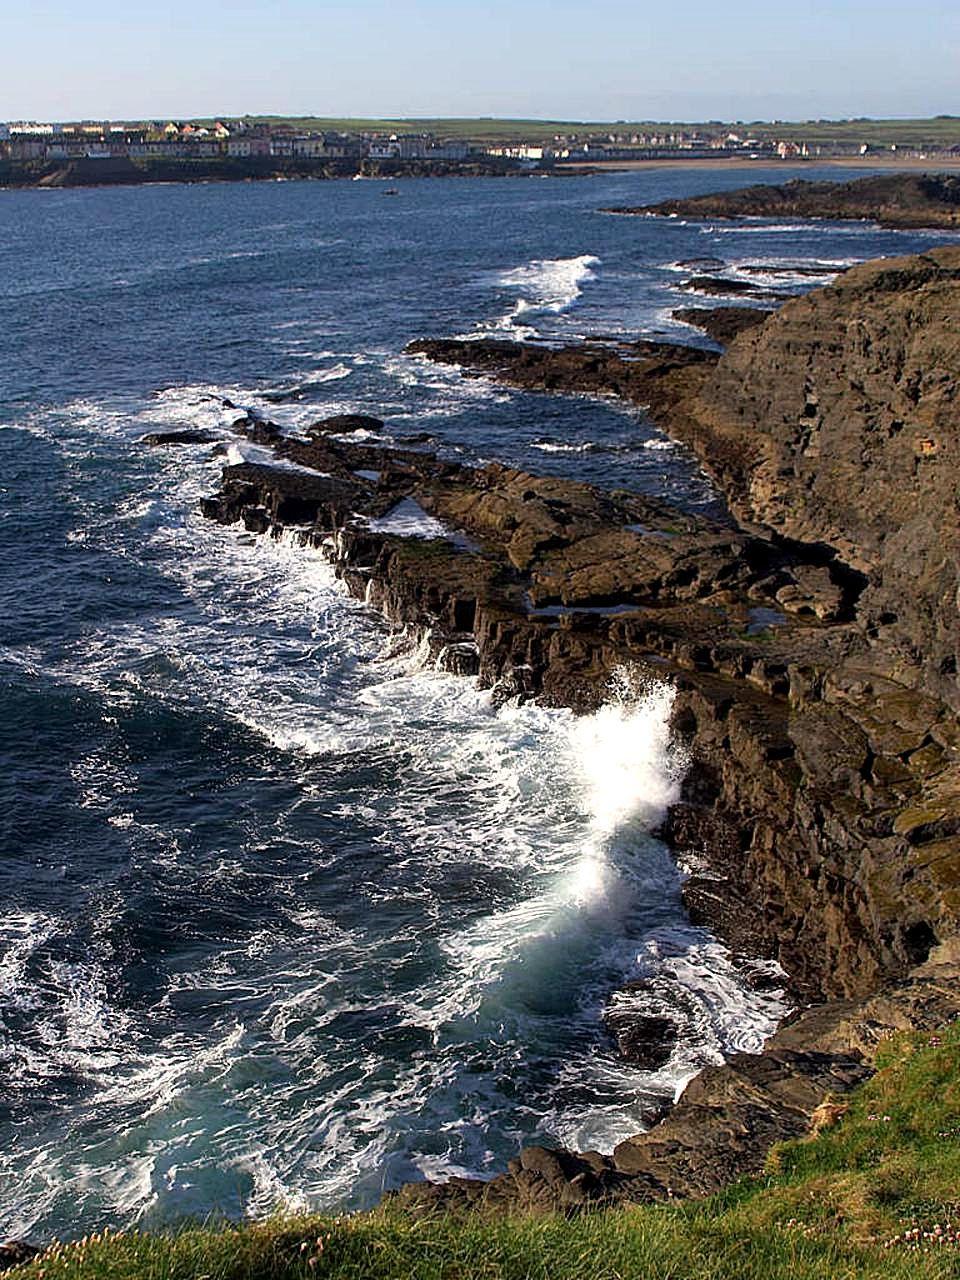 File:Kilkee Ireland.jpg - Wikimedia Commons: commons.wikimedia.org/wiki/file:kilkee_ireland.jpg